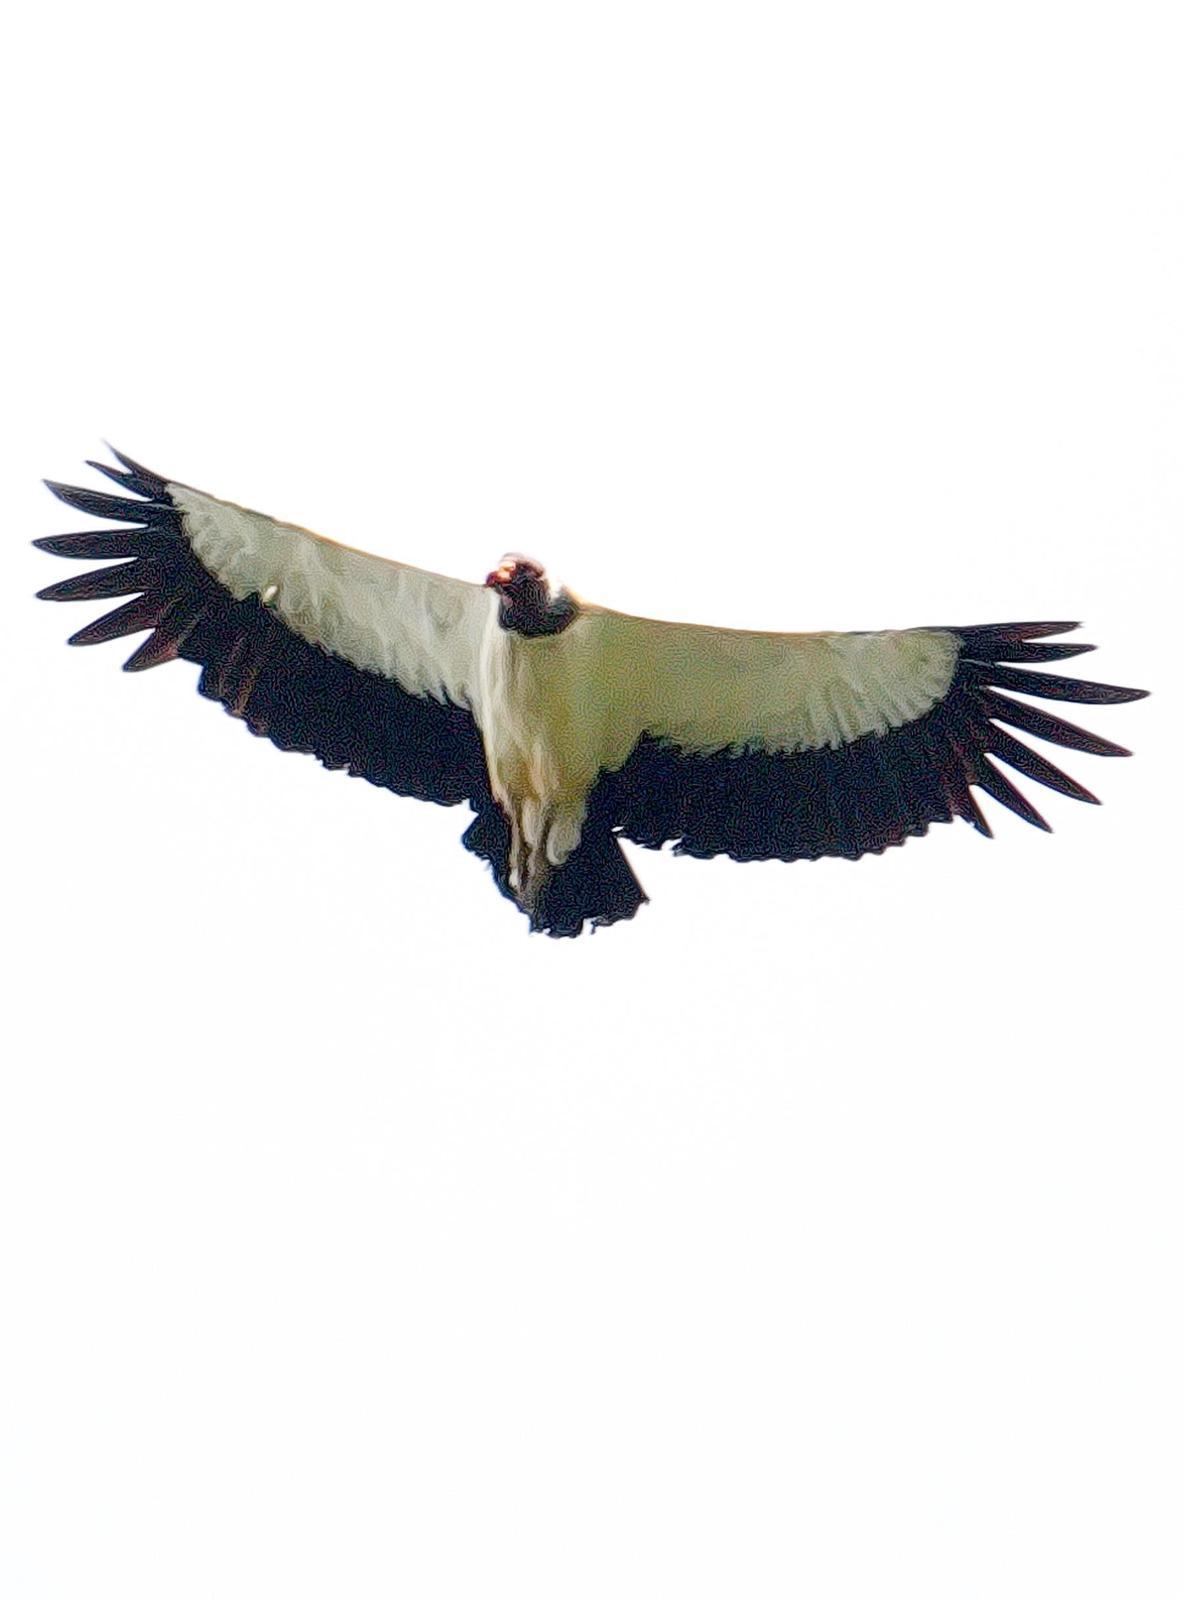 King Vulture Photo by Dan Tallman